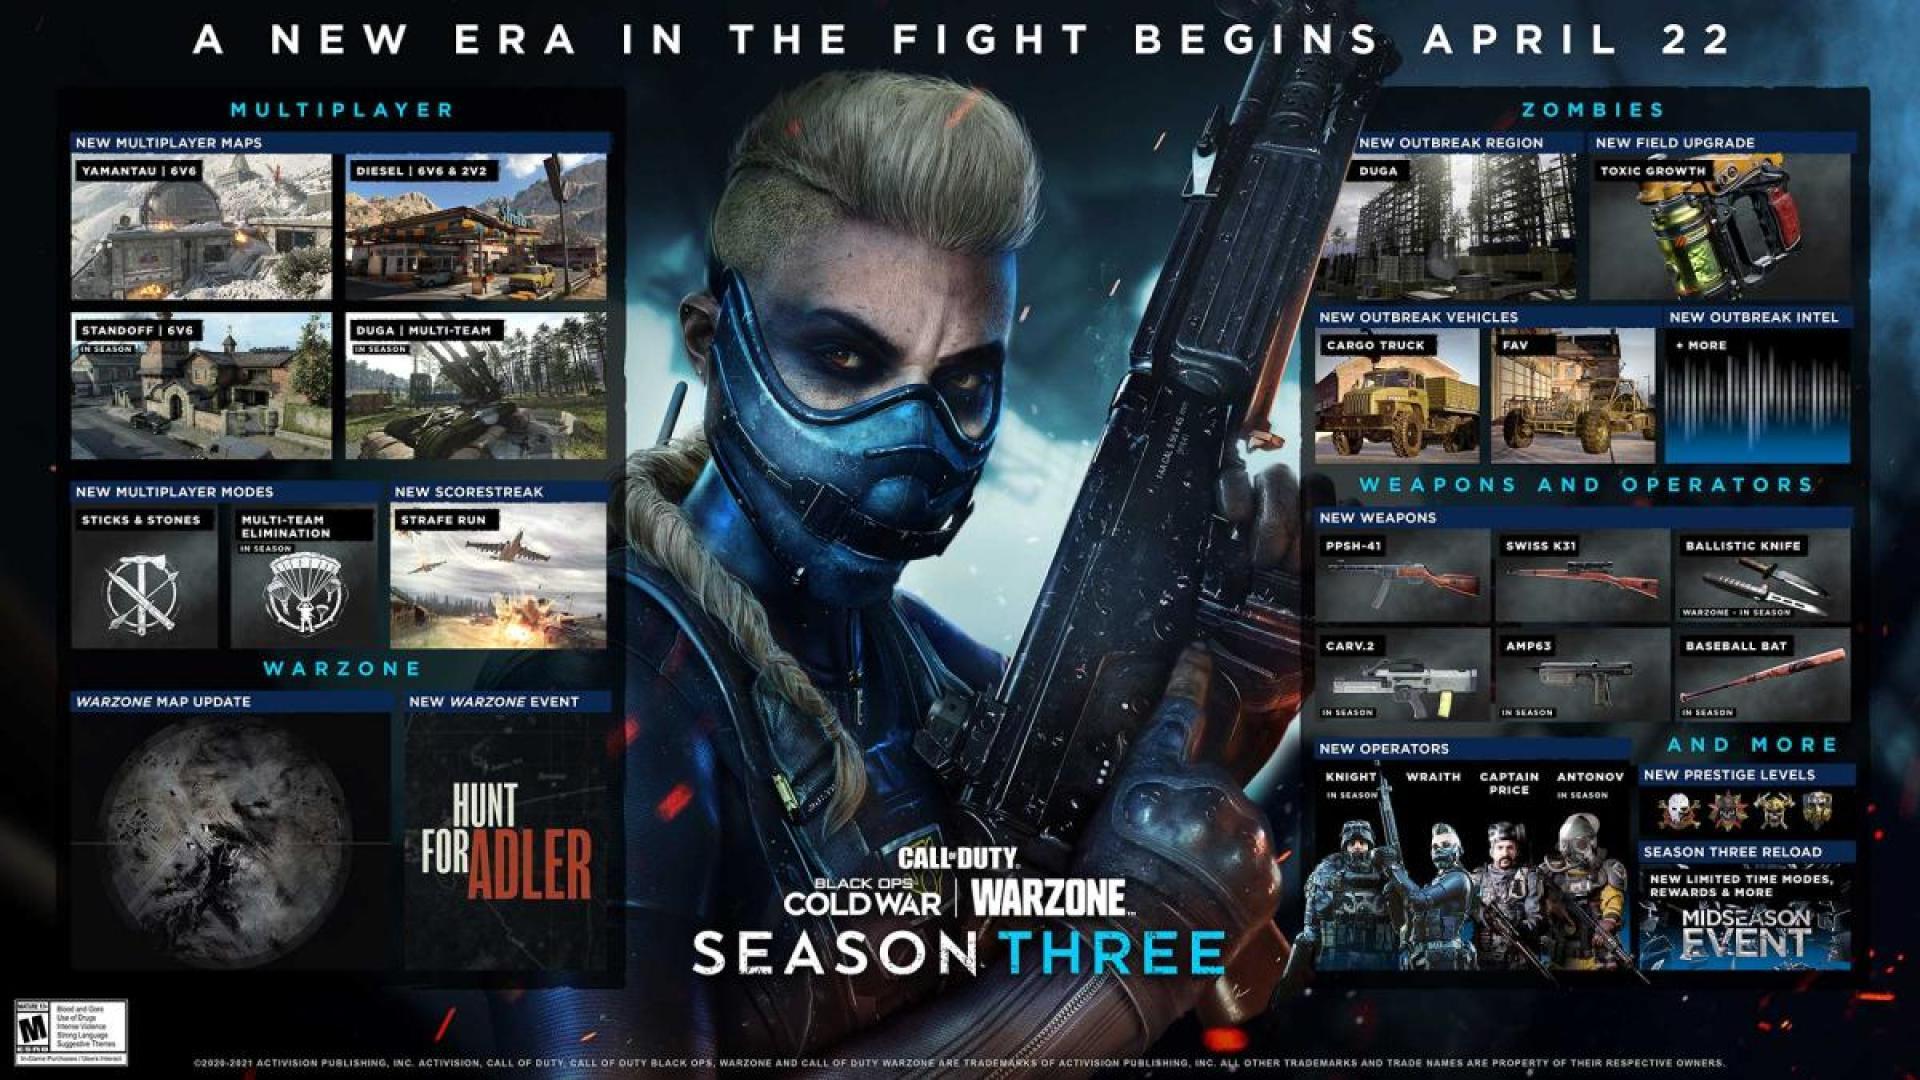 CoD:BOCW&ウォーゾーン:「シーズン3」全貌公開、新マップ4種 / 新武器6種 / ゾンビ・アウトブレイク新章突入など